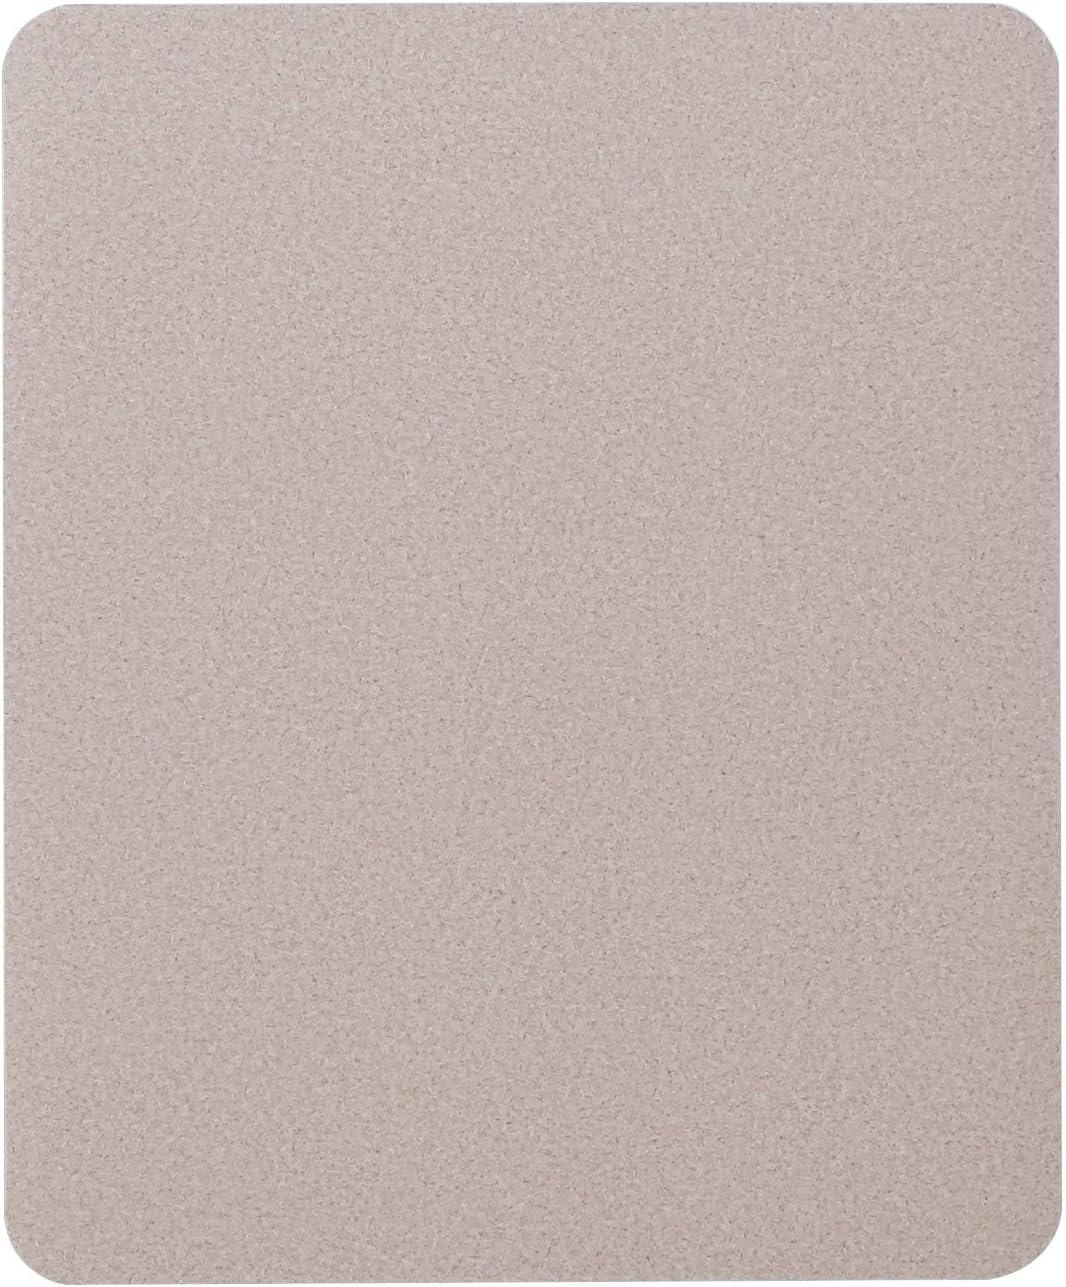 MPLEYE Office Chair Mat for Hardwood Floor and Tile Floor 38